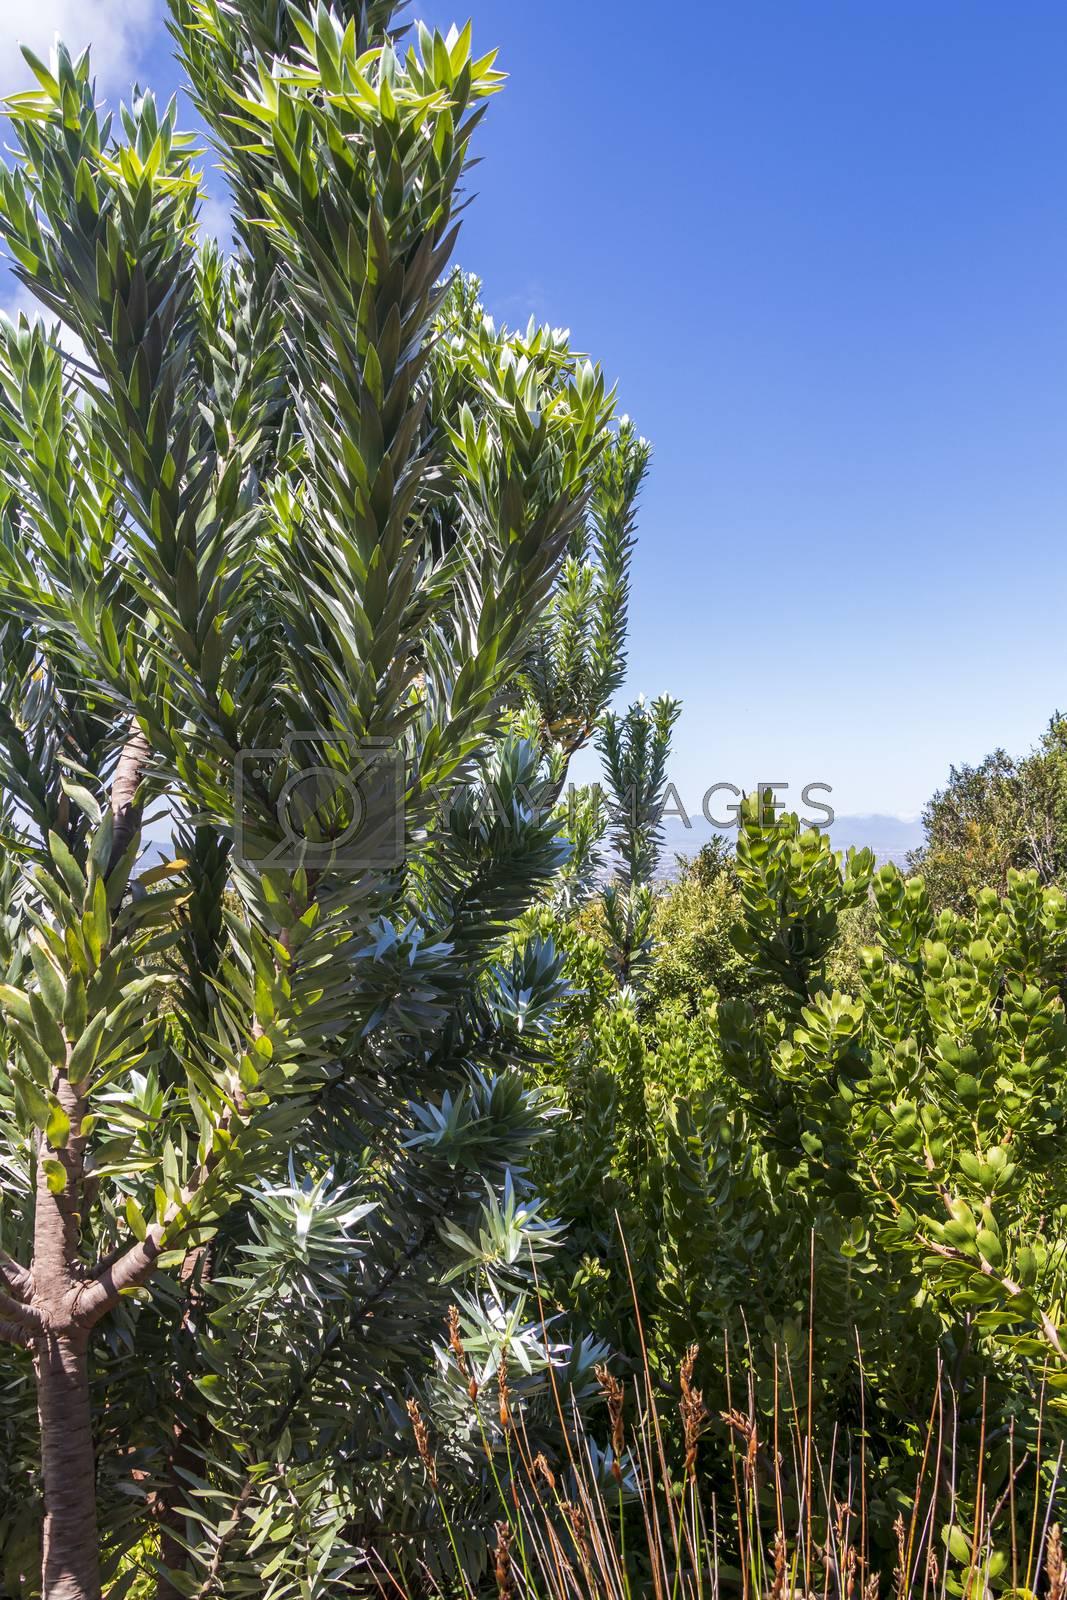 Silver tree Leucadendron argenteum in Kirstenbosch National Botanical Garden panorama, Cape Town, South Africa.